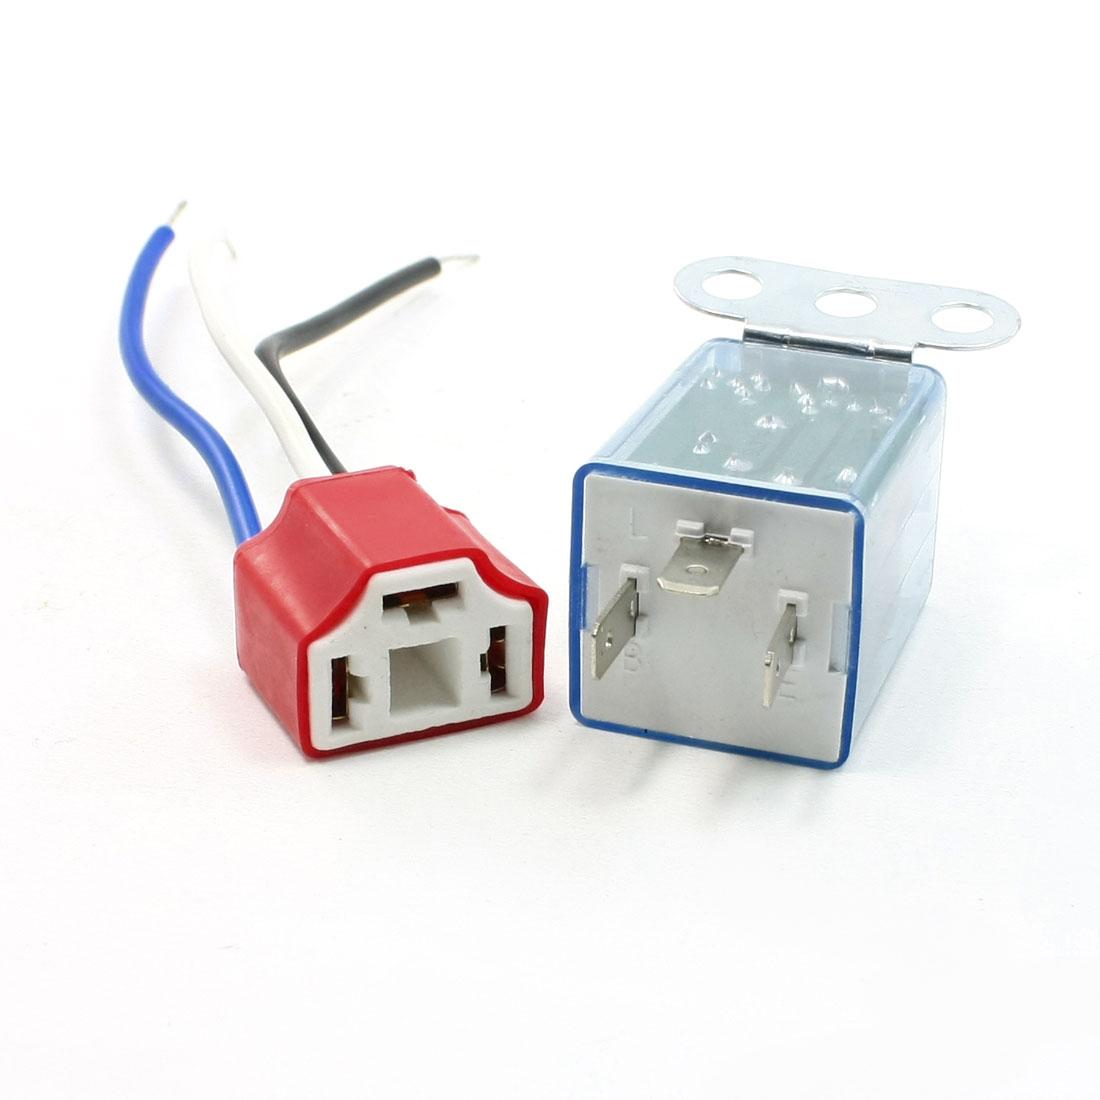 2 Pcs Wired Red Female Ceramic Socket LED Indicator Car Flasher Relay 12VDC